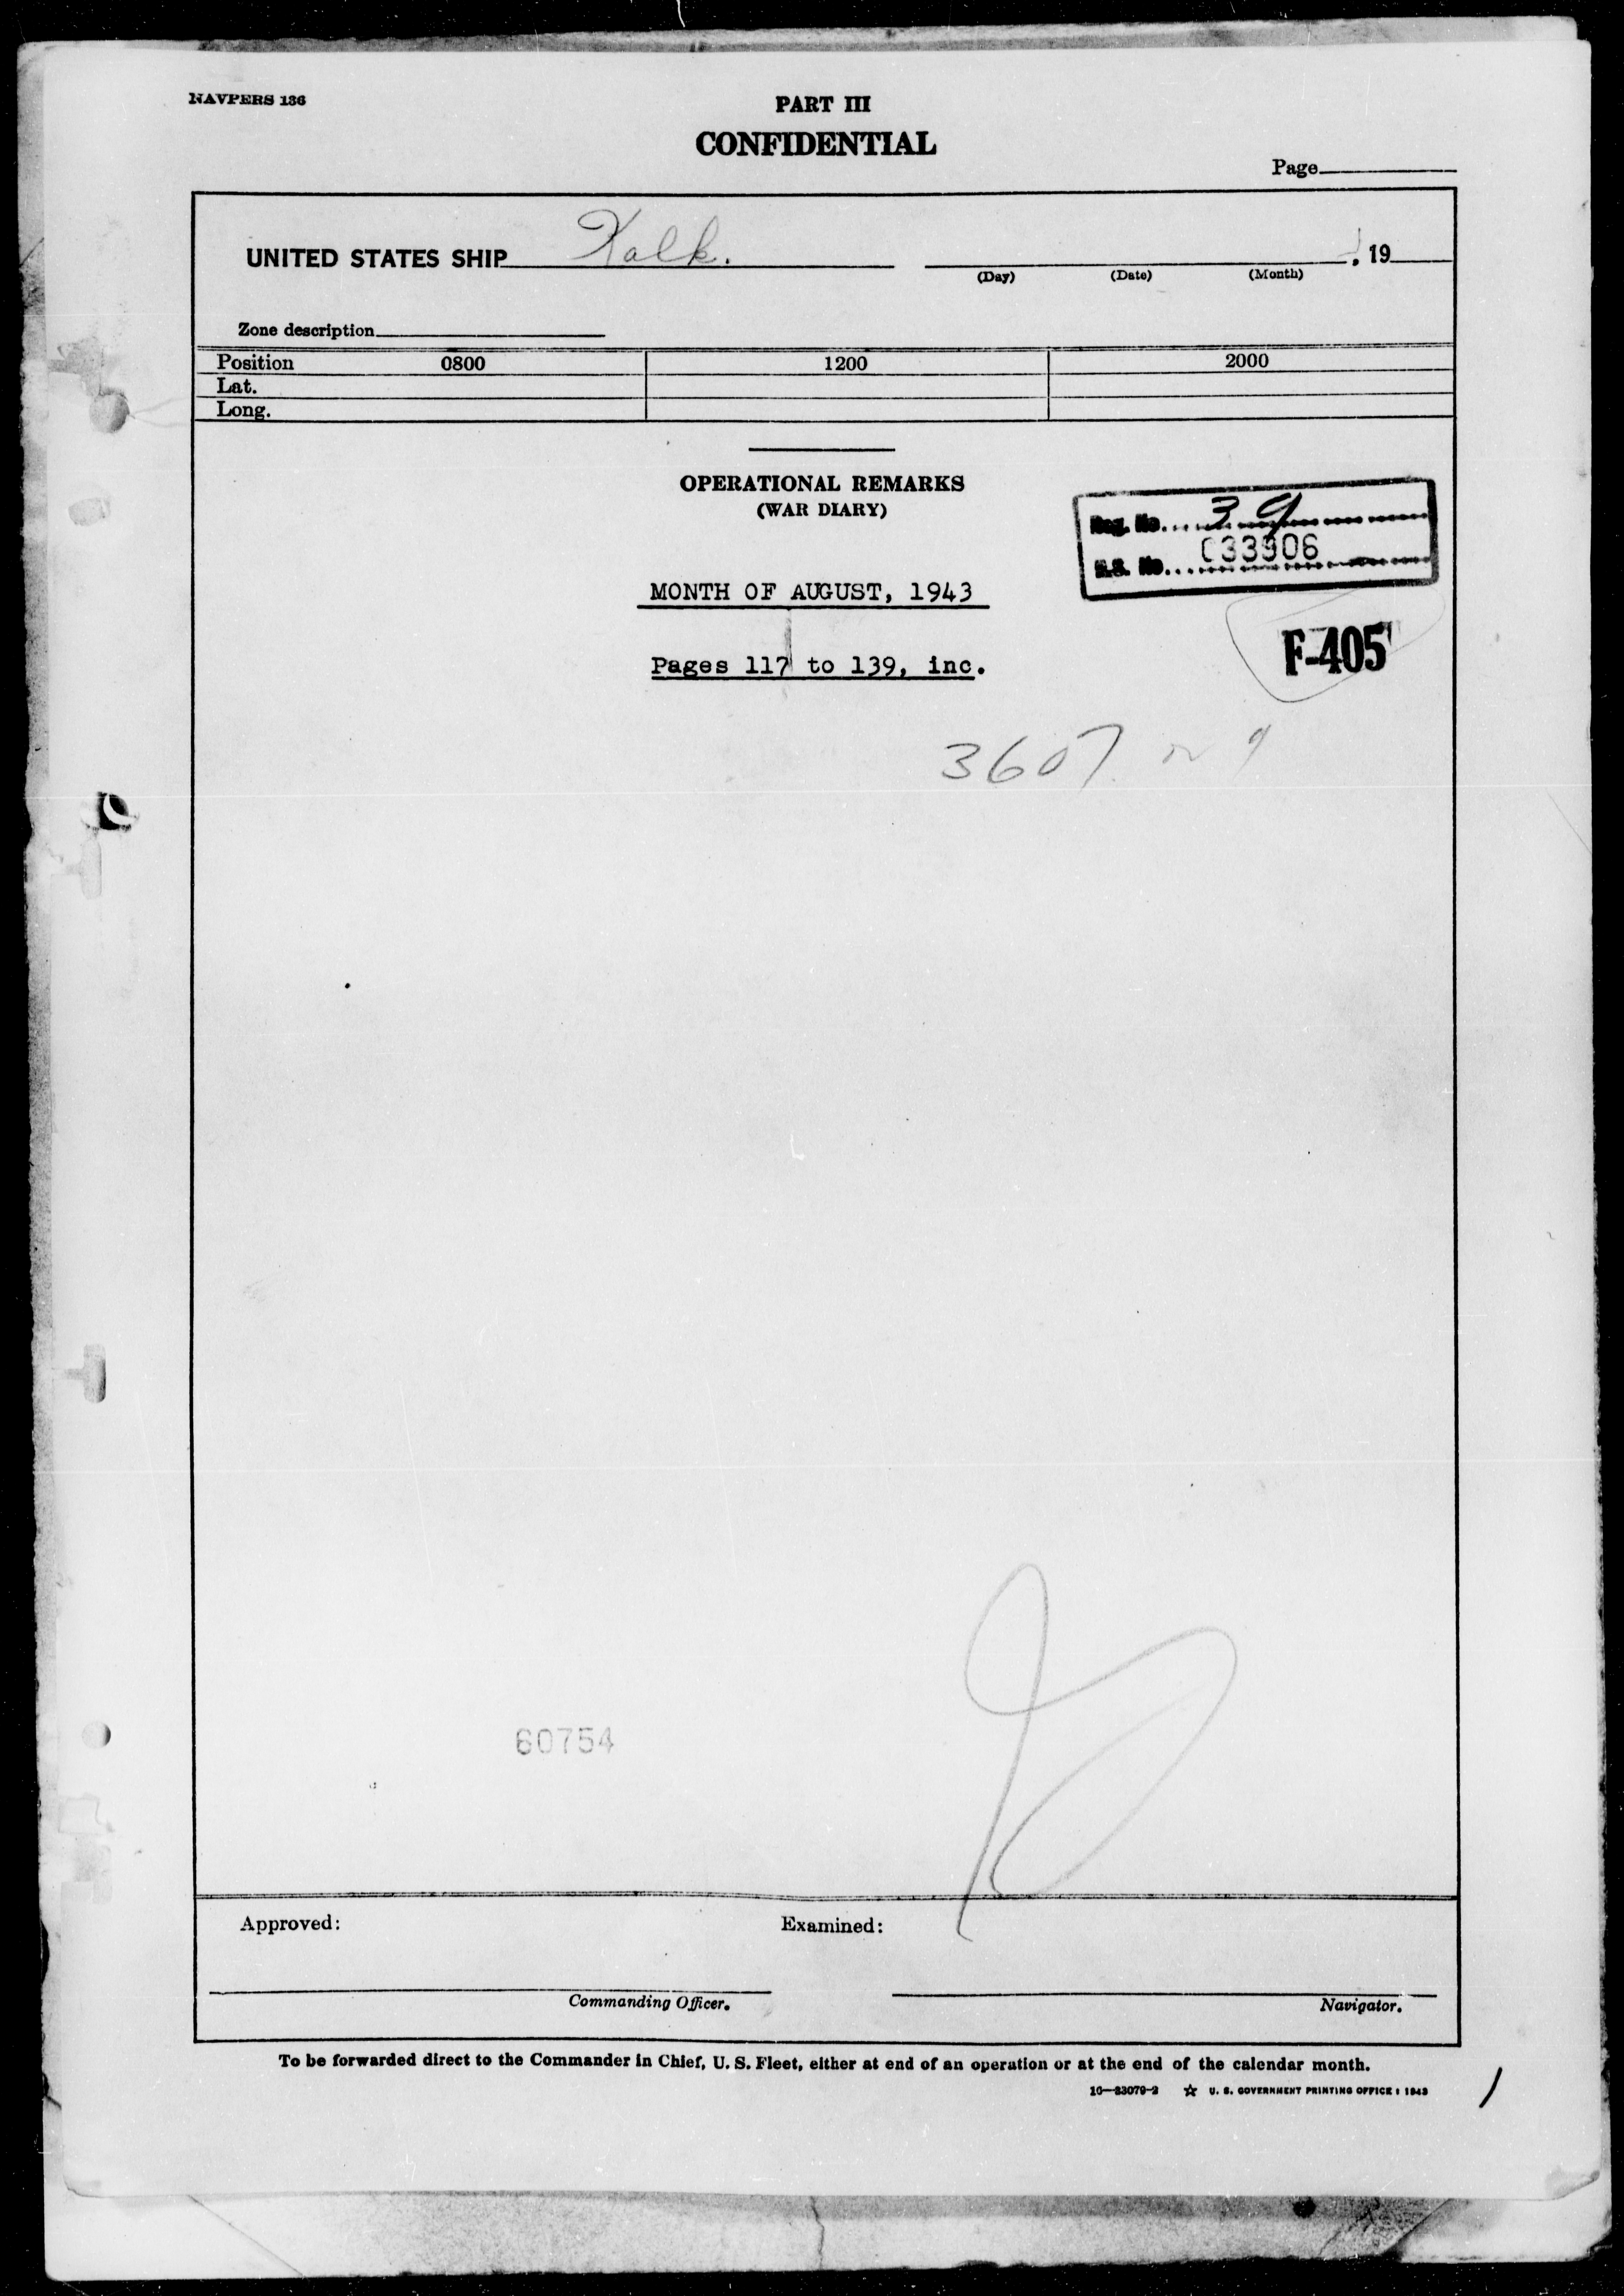 USS KALK - War Diary, 8/1/43 to 11/30/43